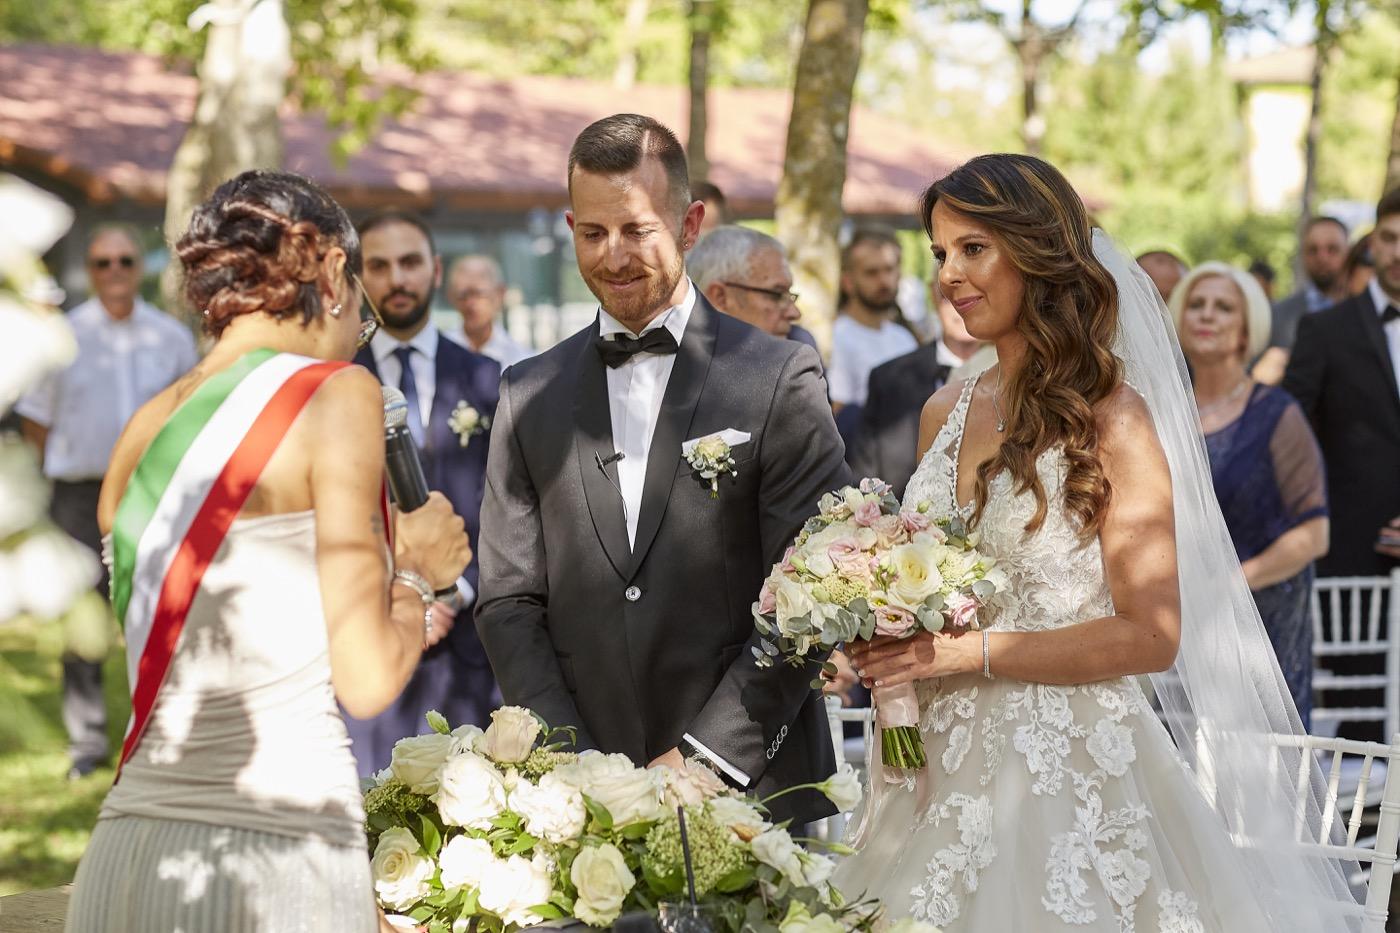 Claudio-Coppola-wedding-photographer-la-scuderia-eventi-preparativi-la-rosetta-perugia-48